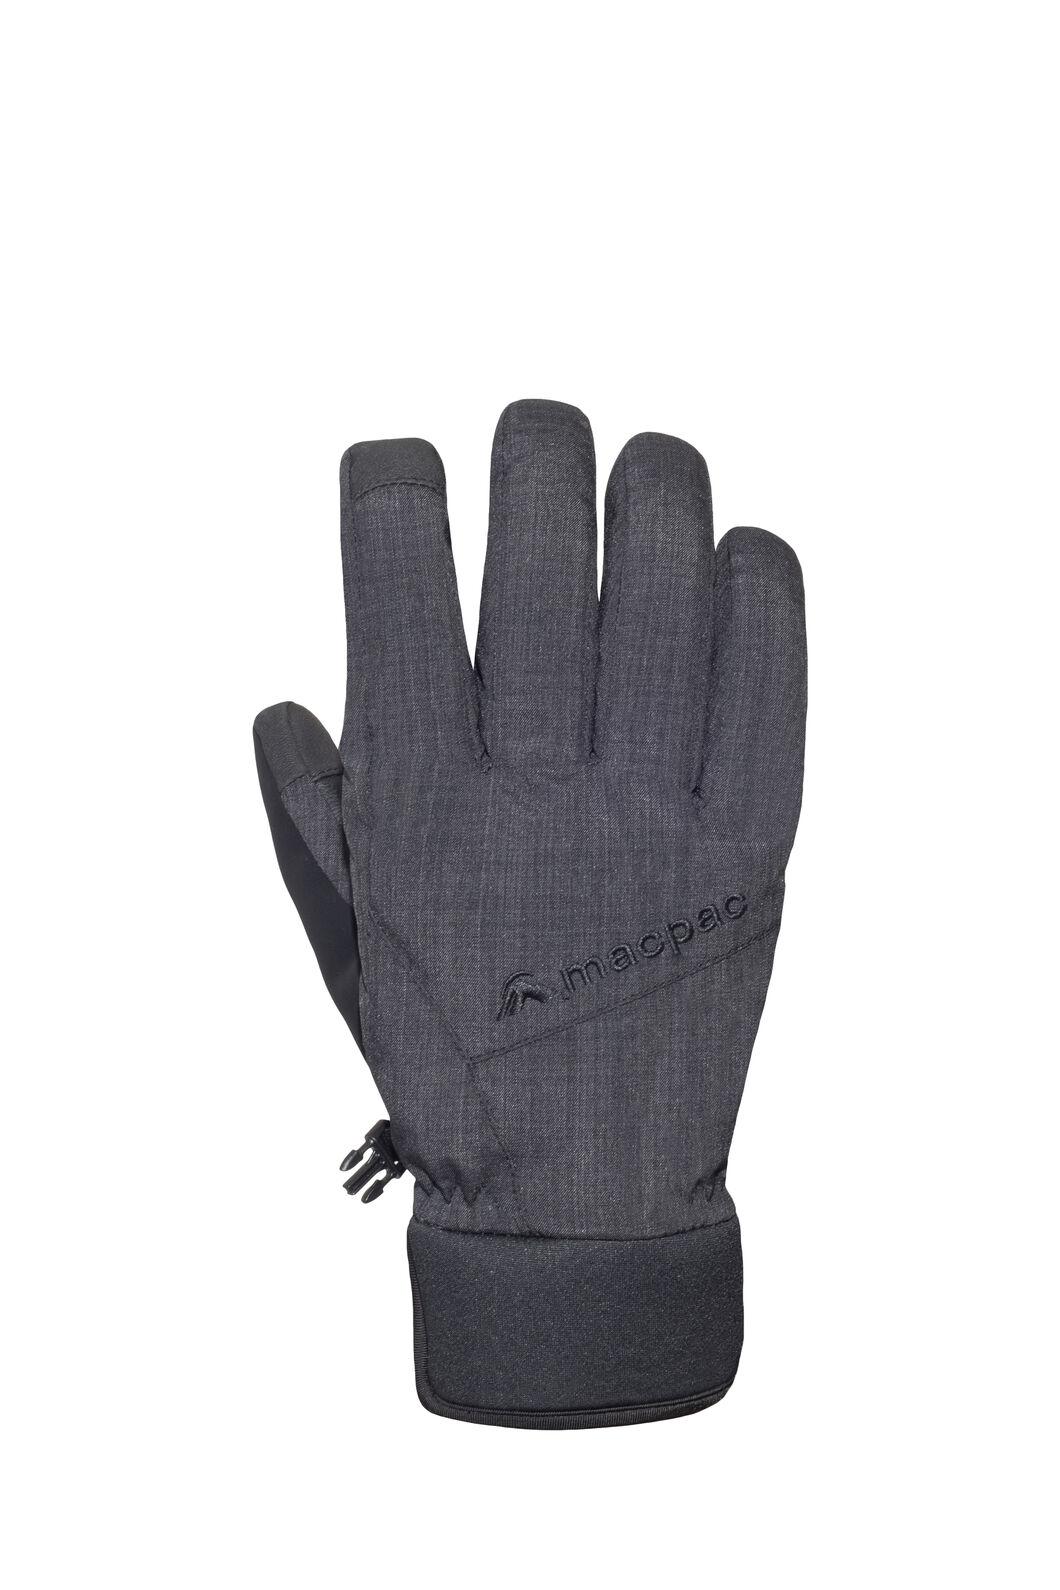 Macpac Piste Gloves, Black, hi-res